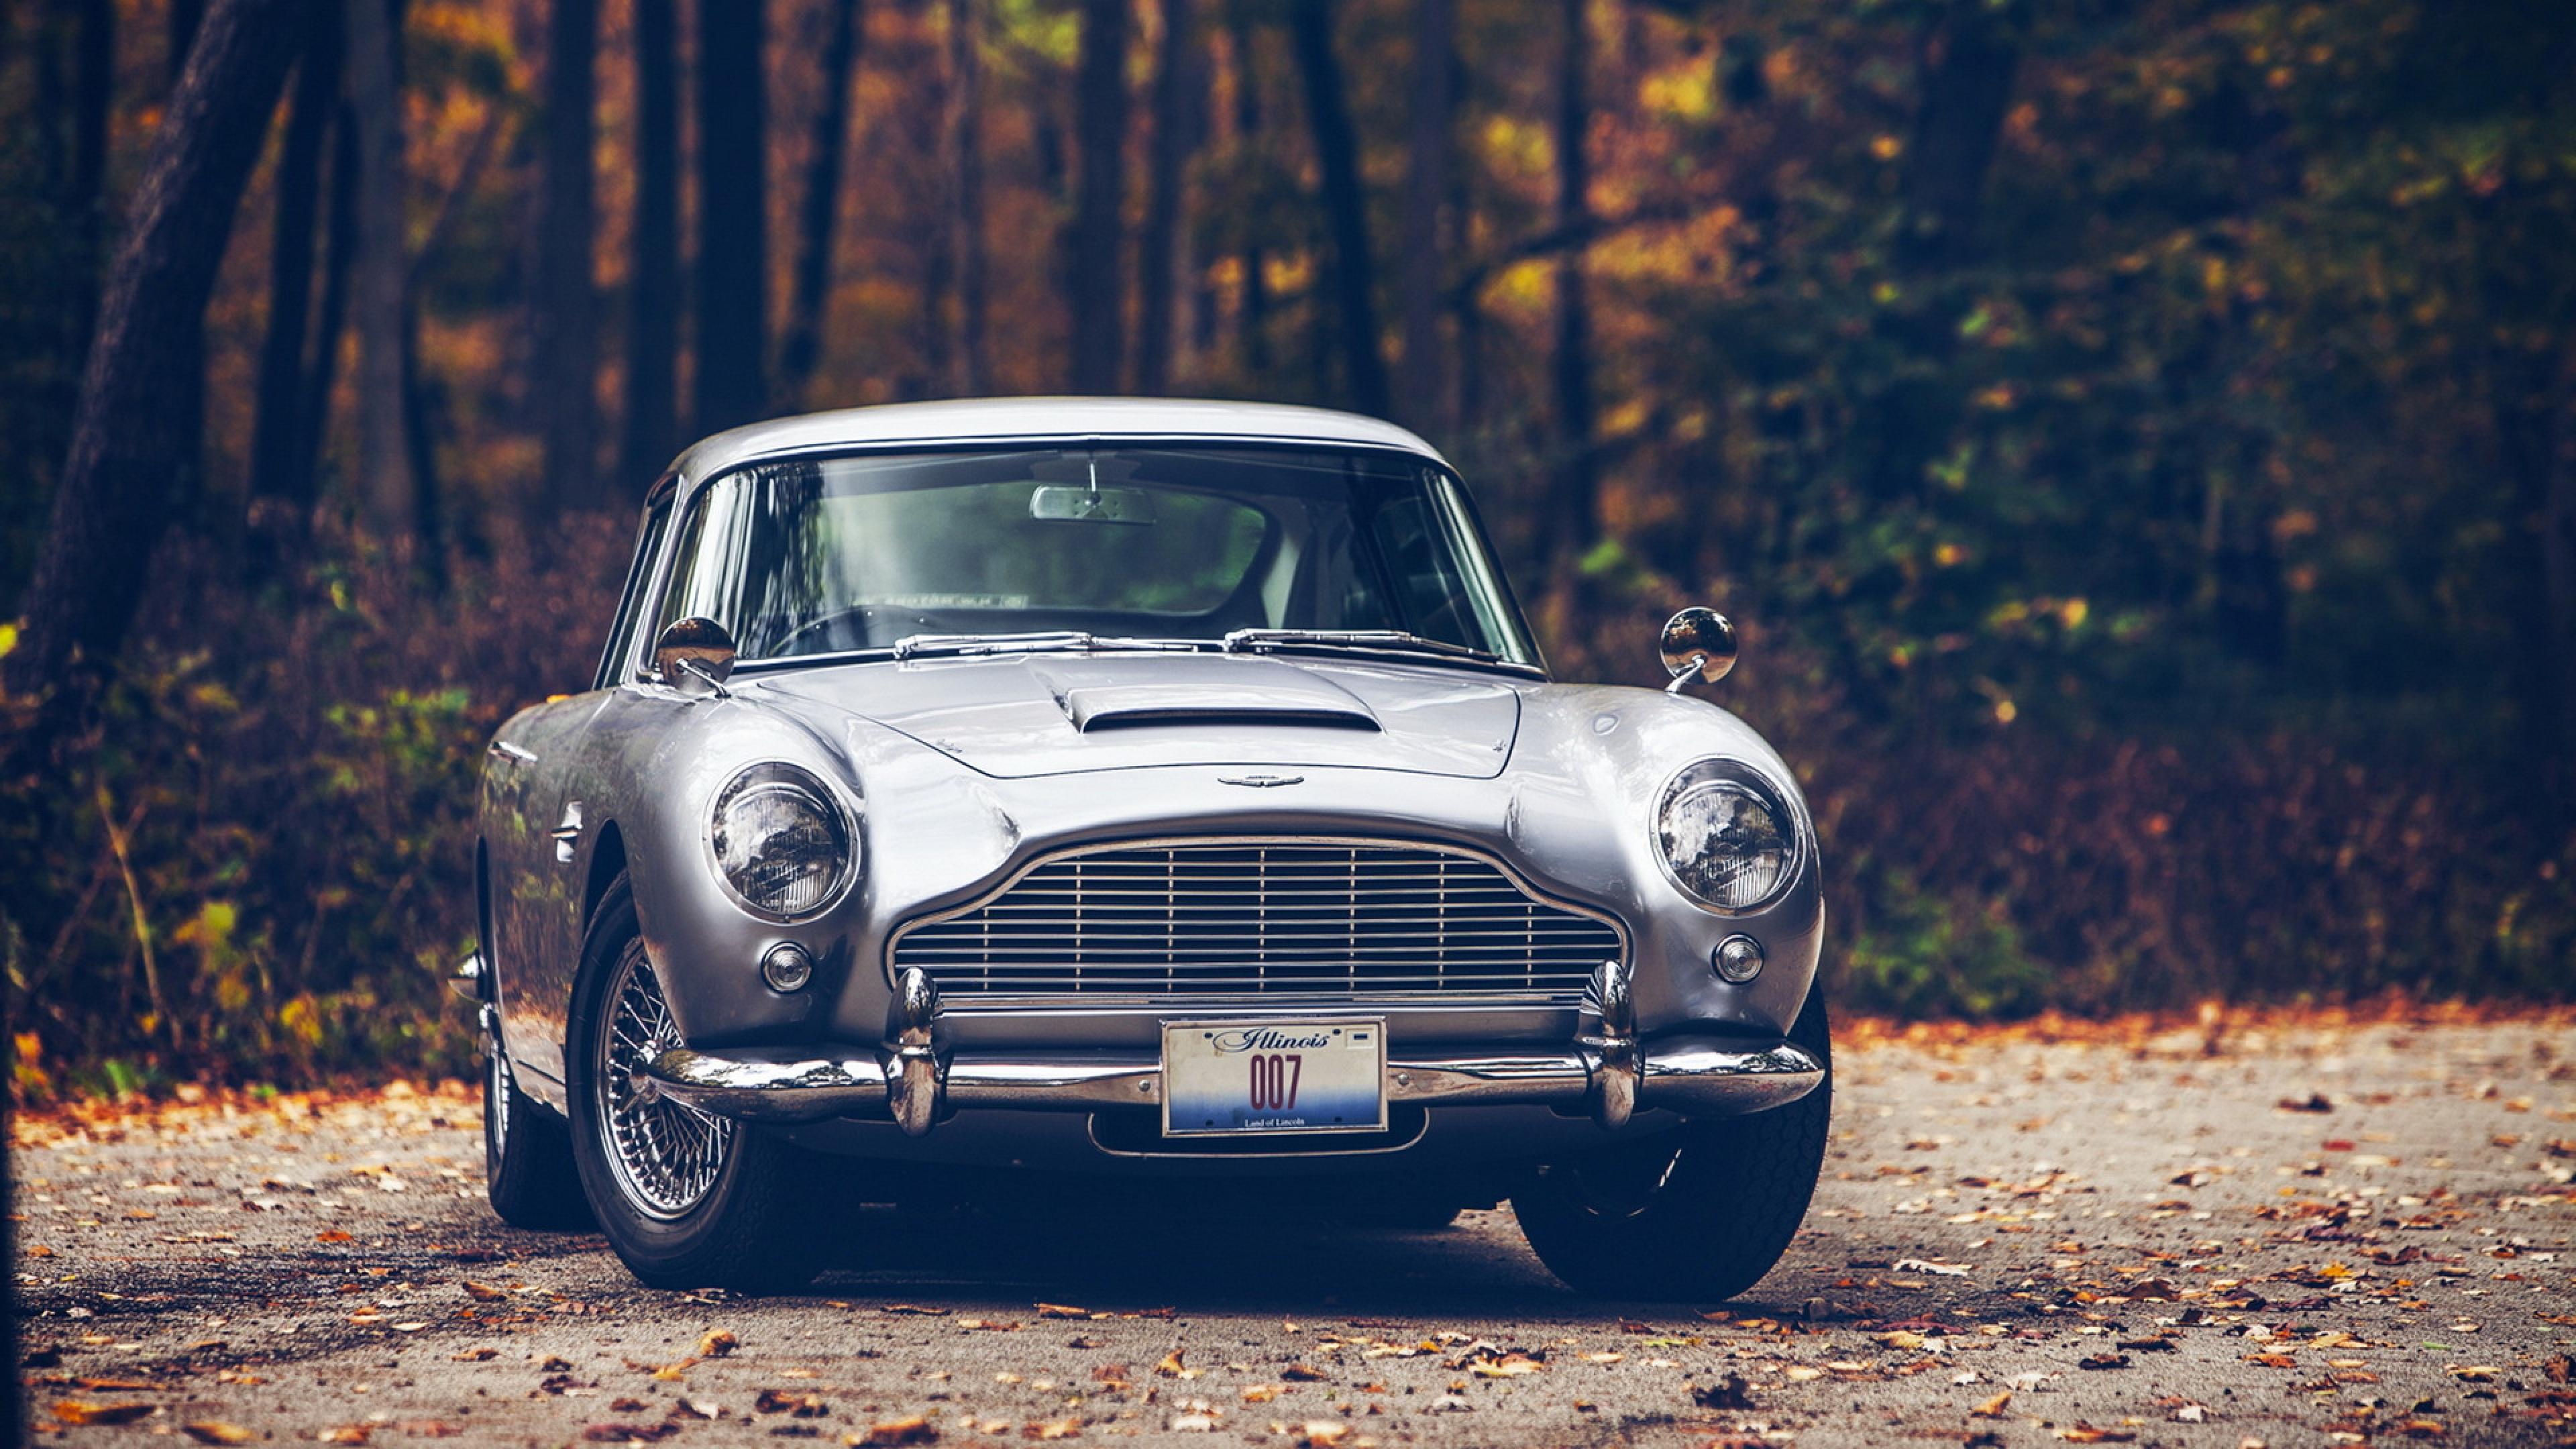 Aston Martin DB5 Wallpapers 26 3840x2160